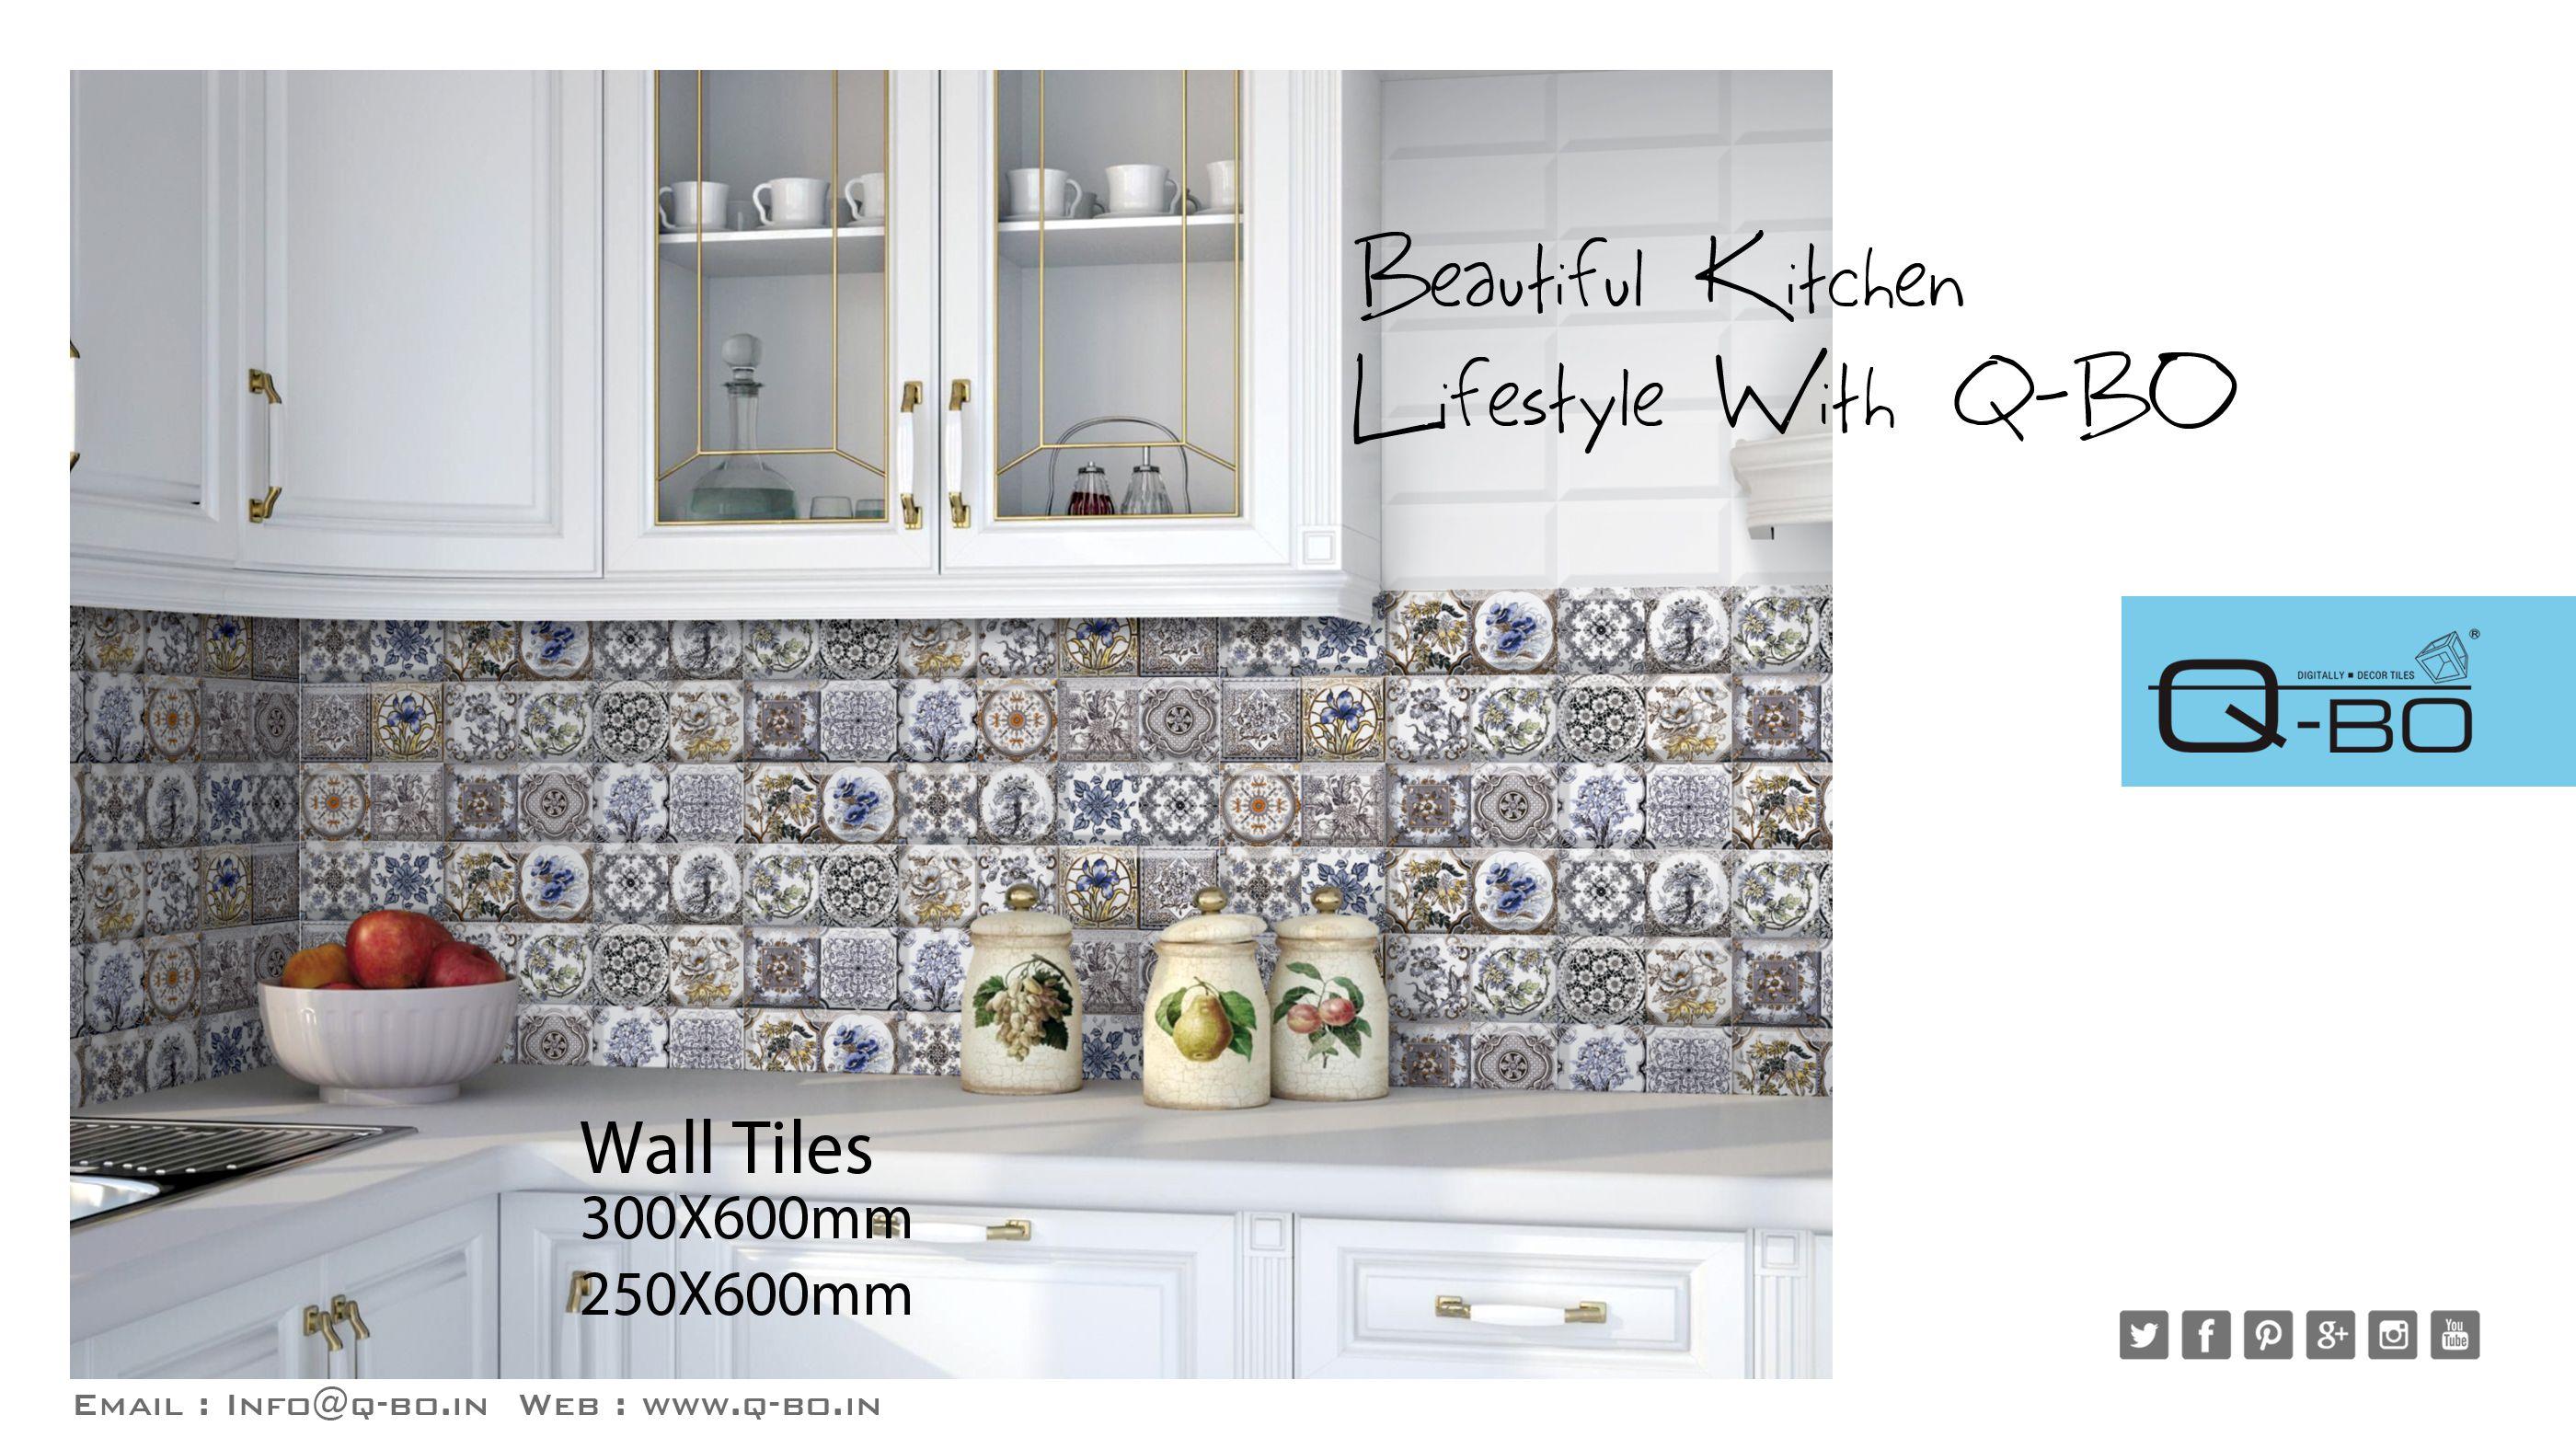 Beautiful kitchen lifestyle with Q-BO. #Q_BO #digital #decor #ceramic